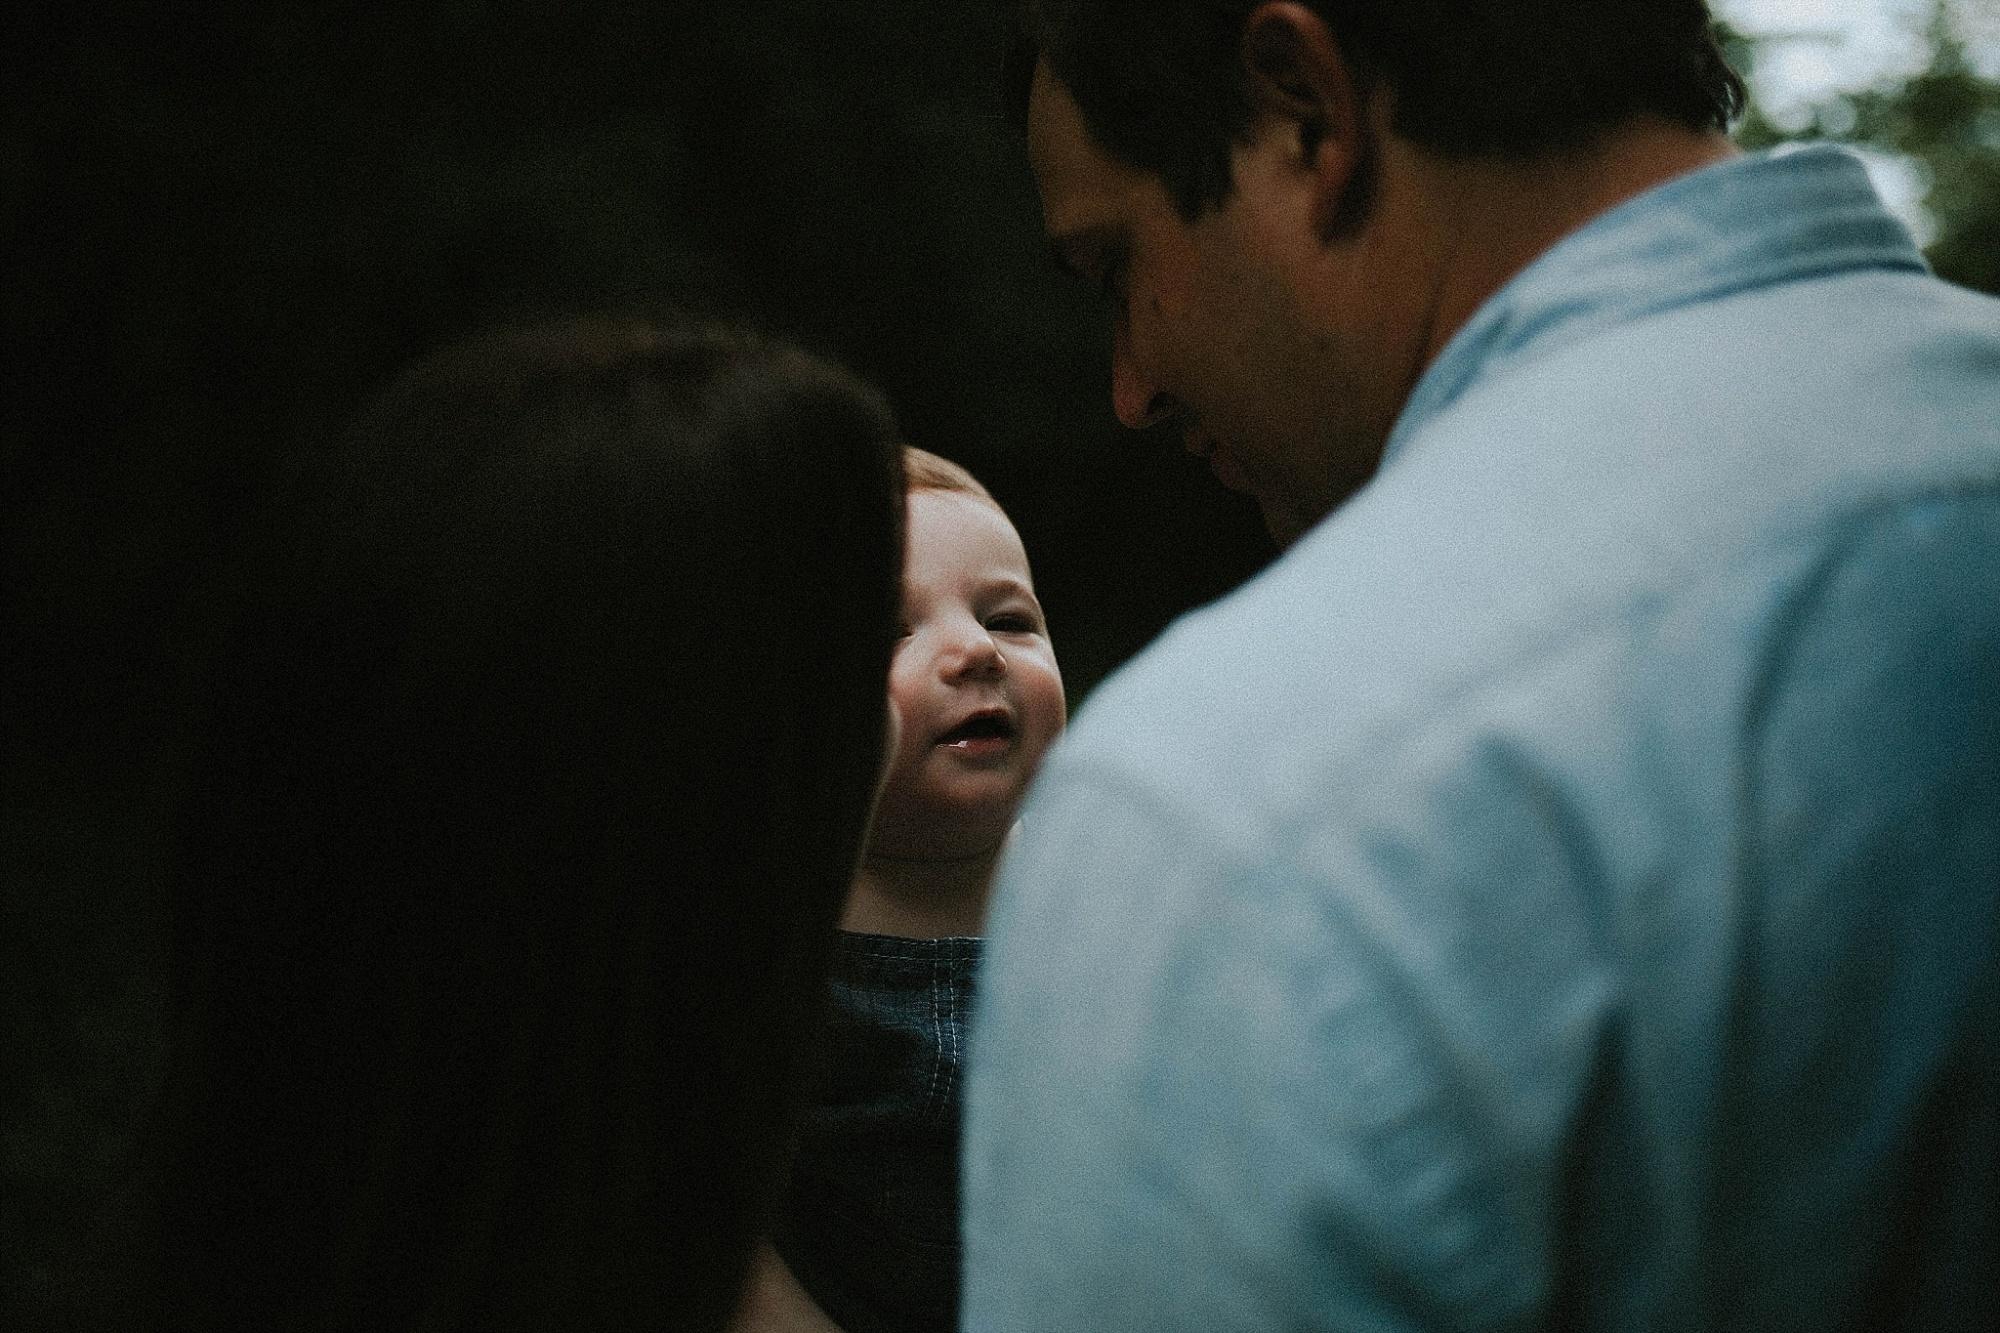 ADRI DE LA CRUZ CHICAGO AND WEST SUBURBS FAMILY PHOTOGRAPHER (15)